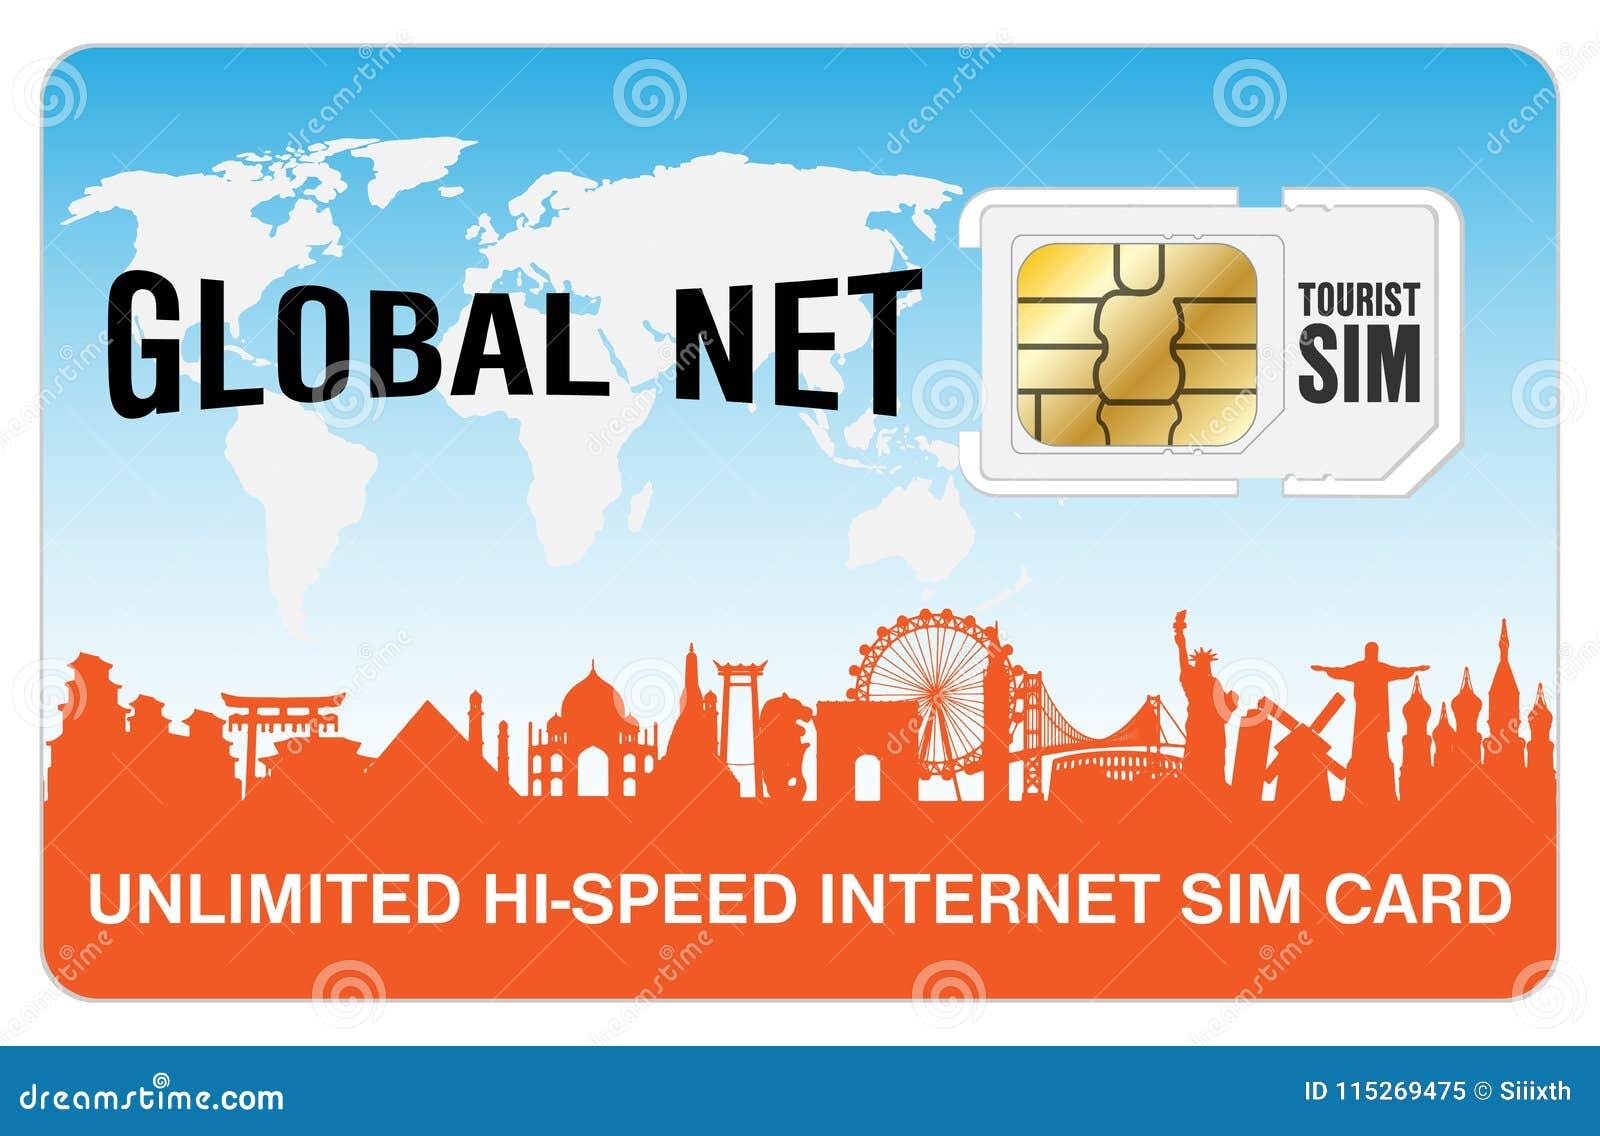 a global travel tourist internet smartphone sim card - Global Travel Card